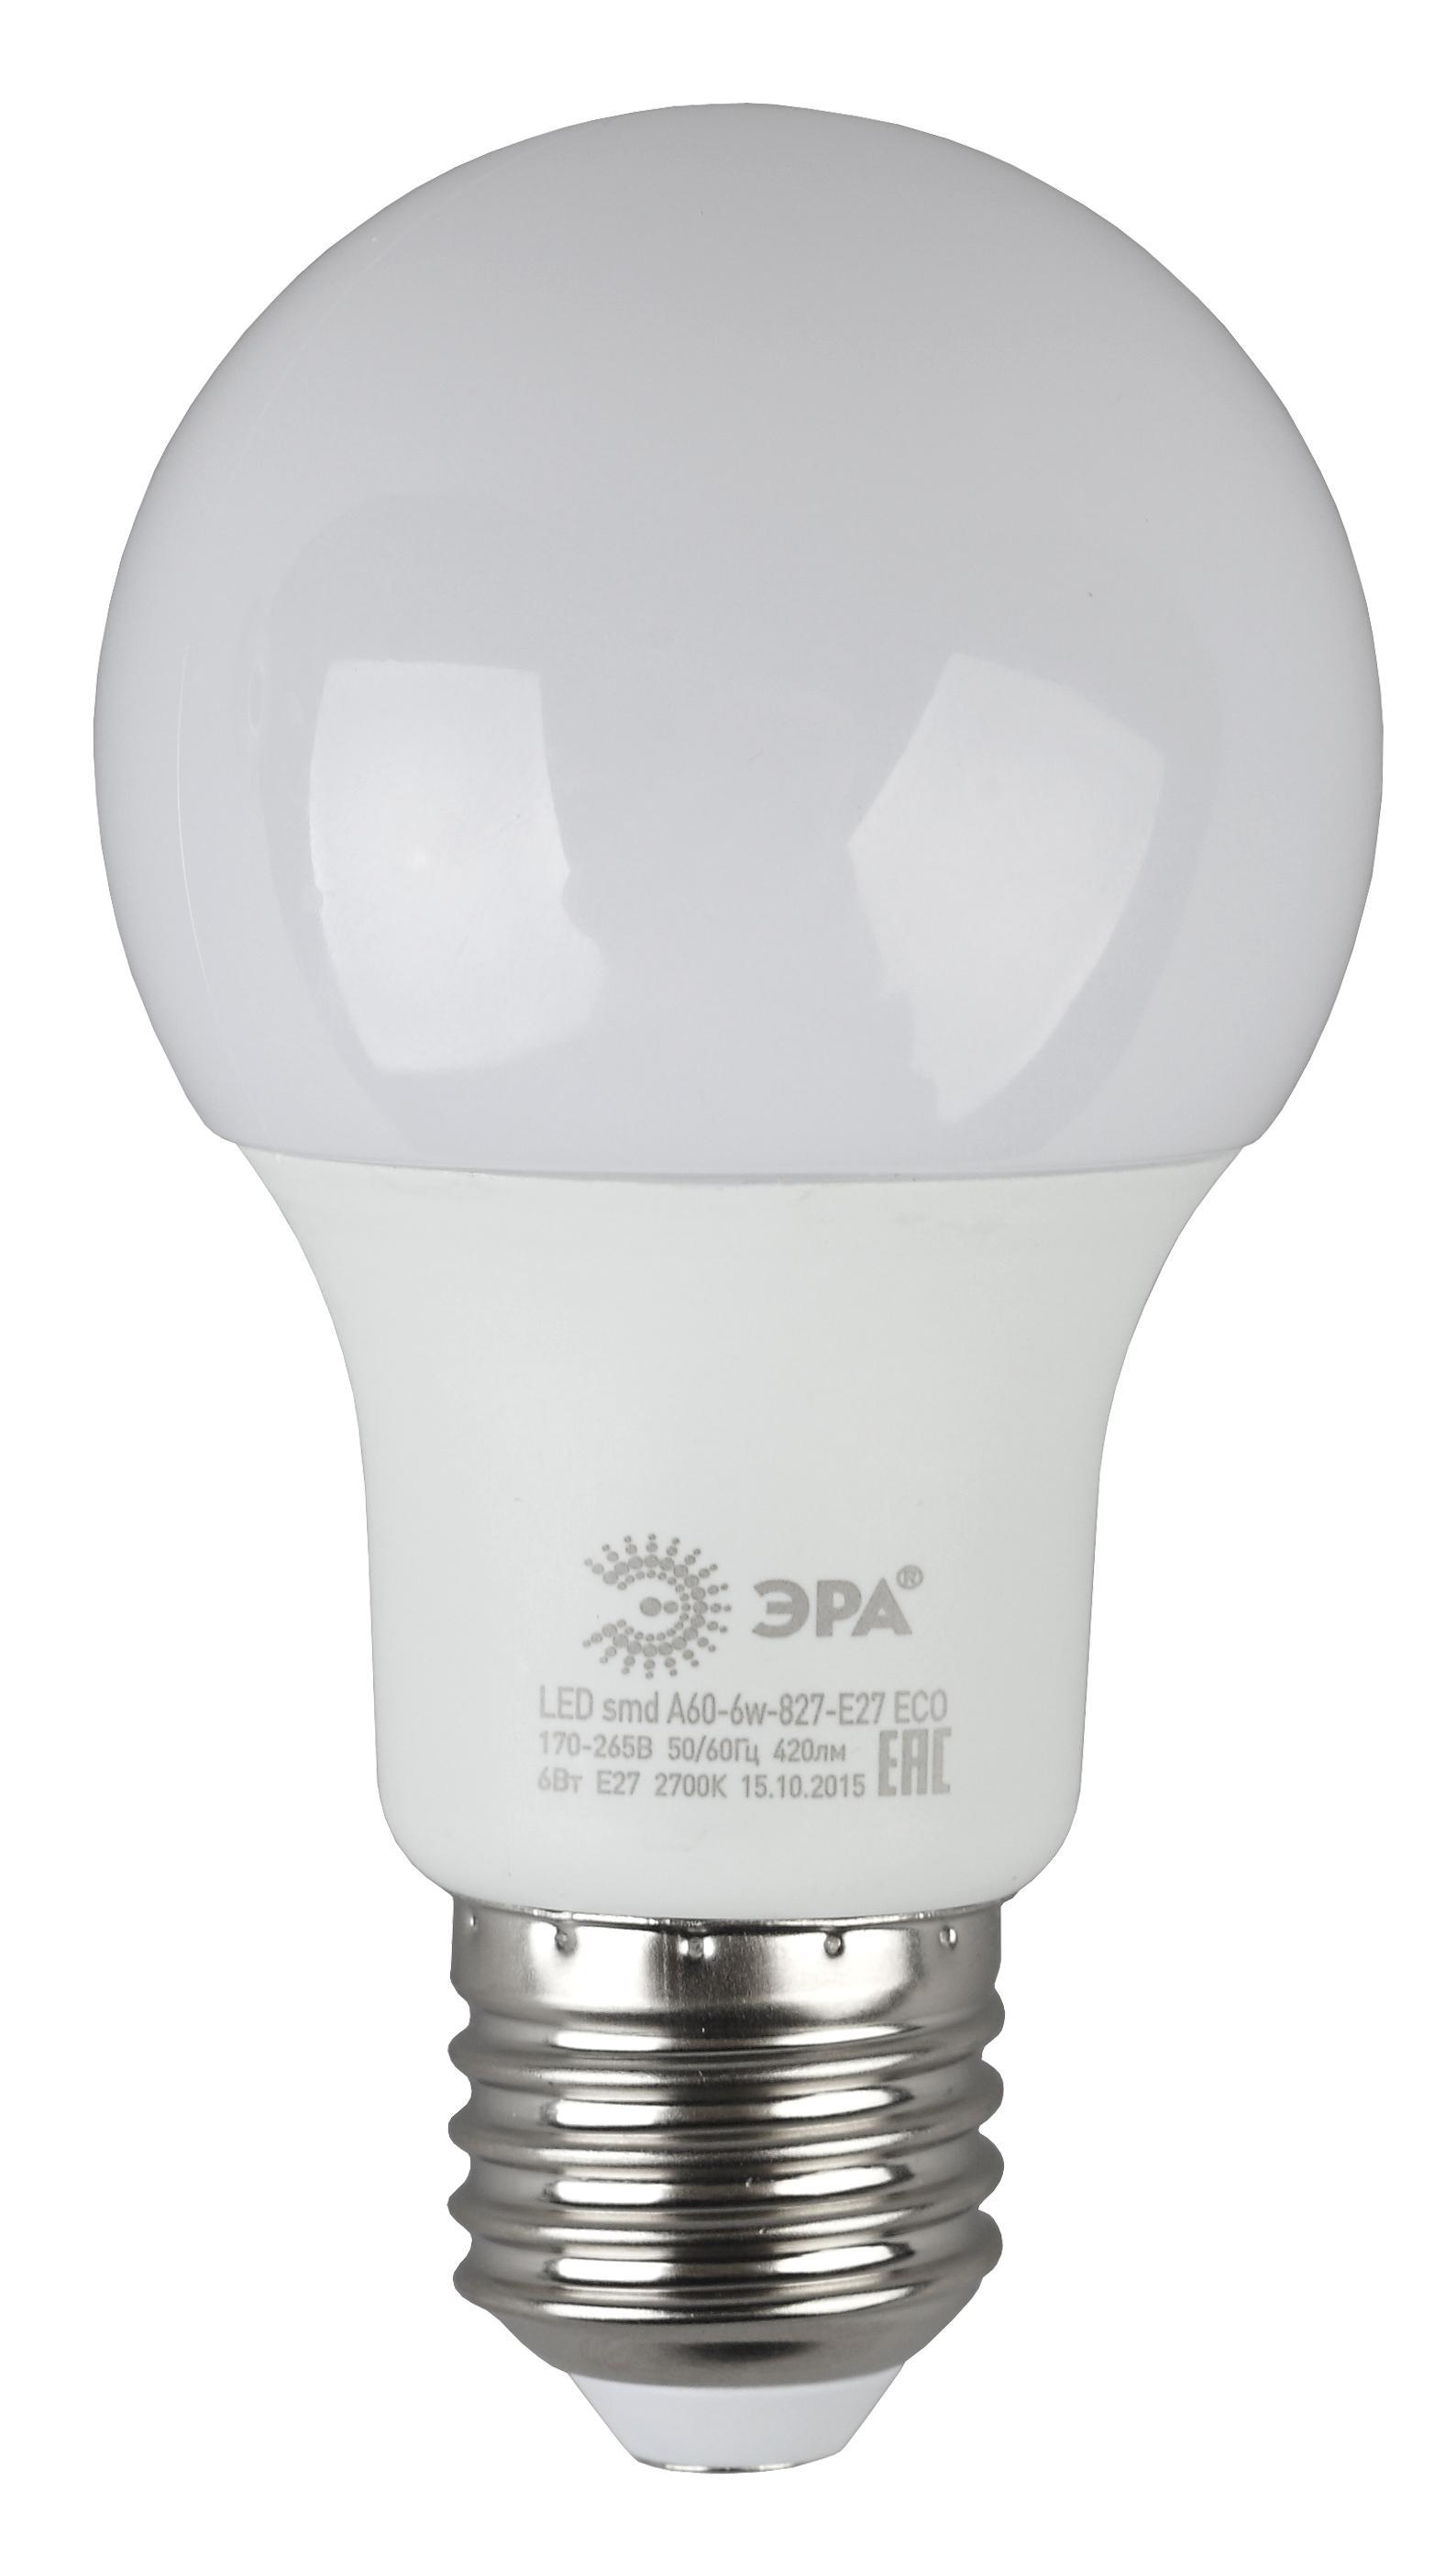 Лампа светодиодная ЭРА Led smd a60-6w-827-e27_eco